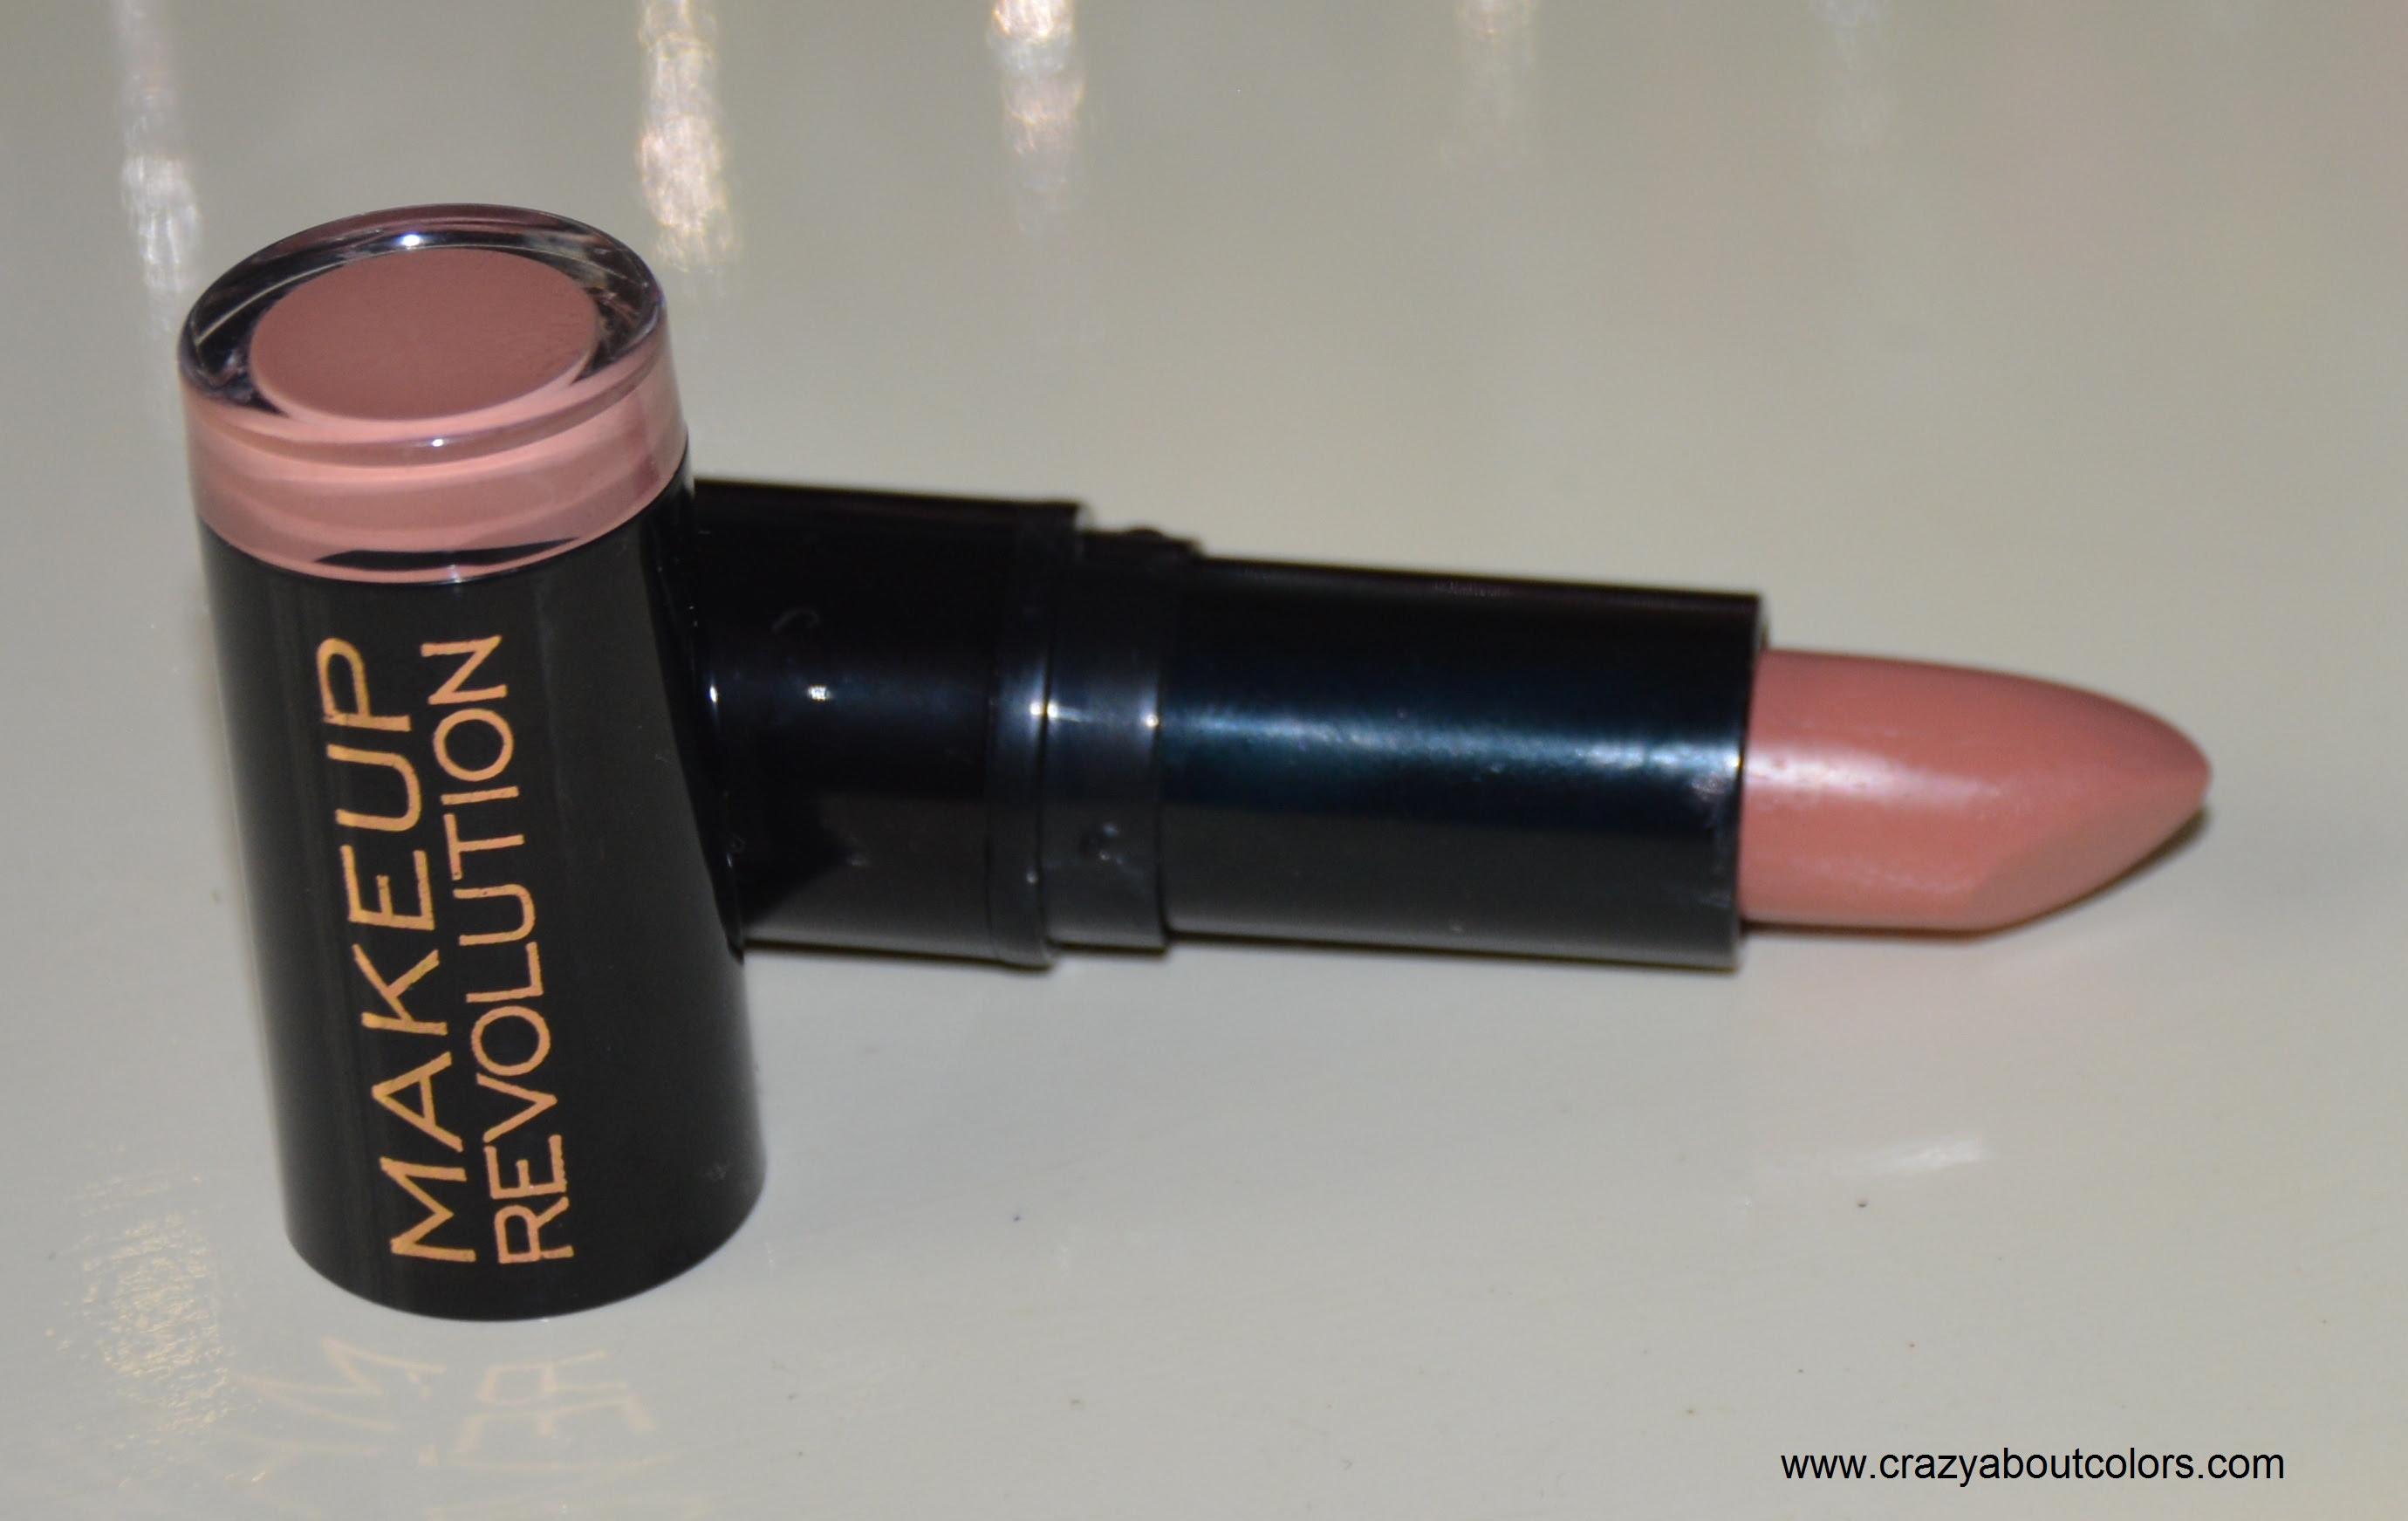 Makeup revolution amazing lipstick swatches